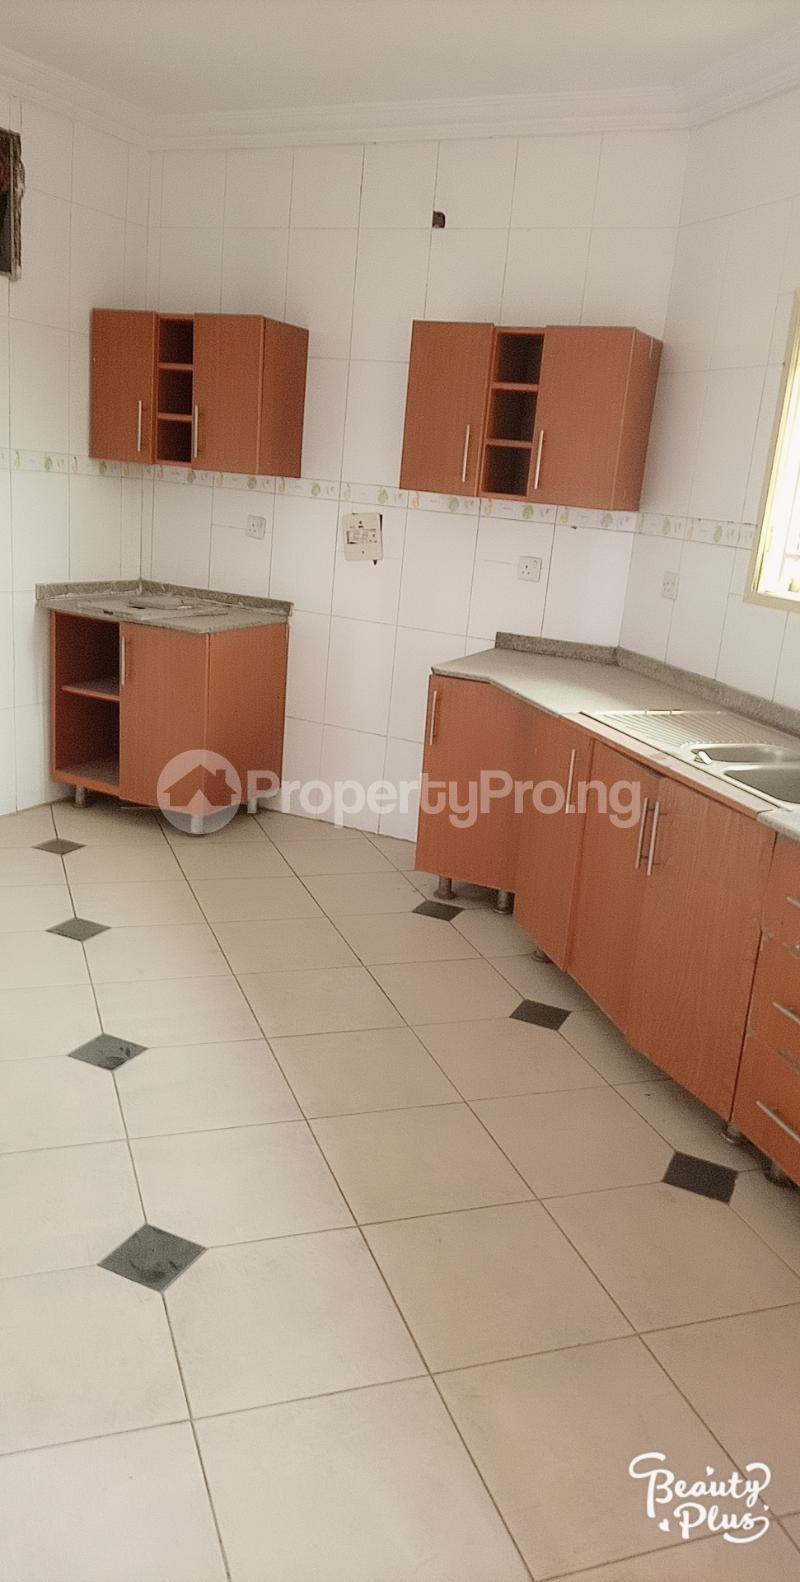 3 bedroom Flat / Apartment for rent Oke Afa isolo. Lagos Mainland Oke-Afa Isolo Lagos - 6